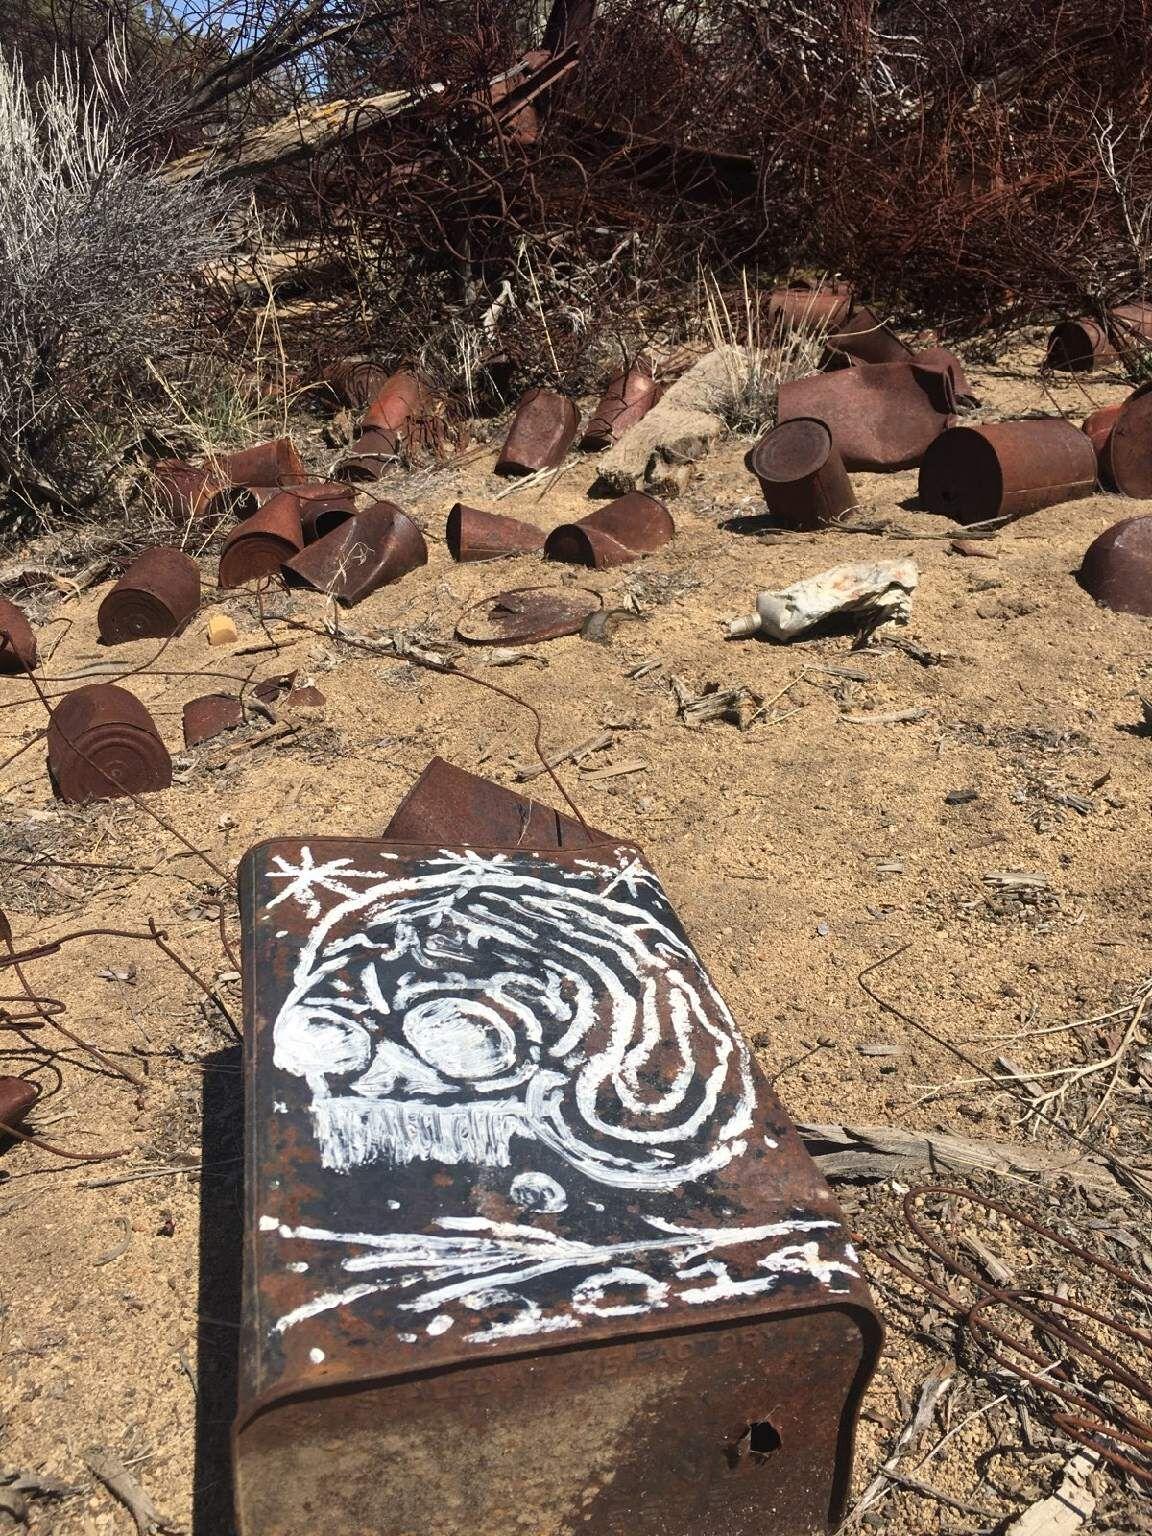 garbage midden chitwood trail